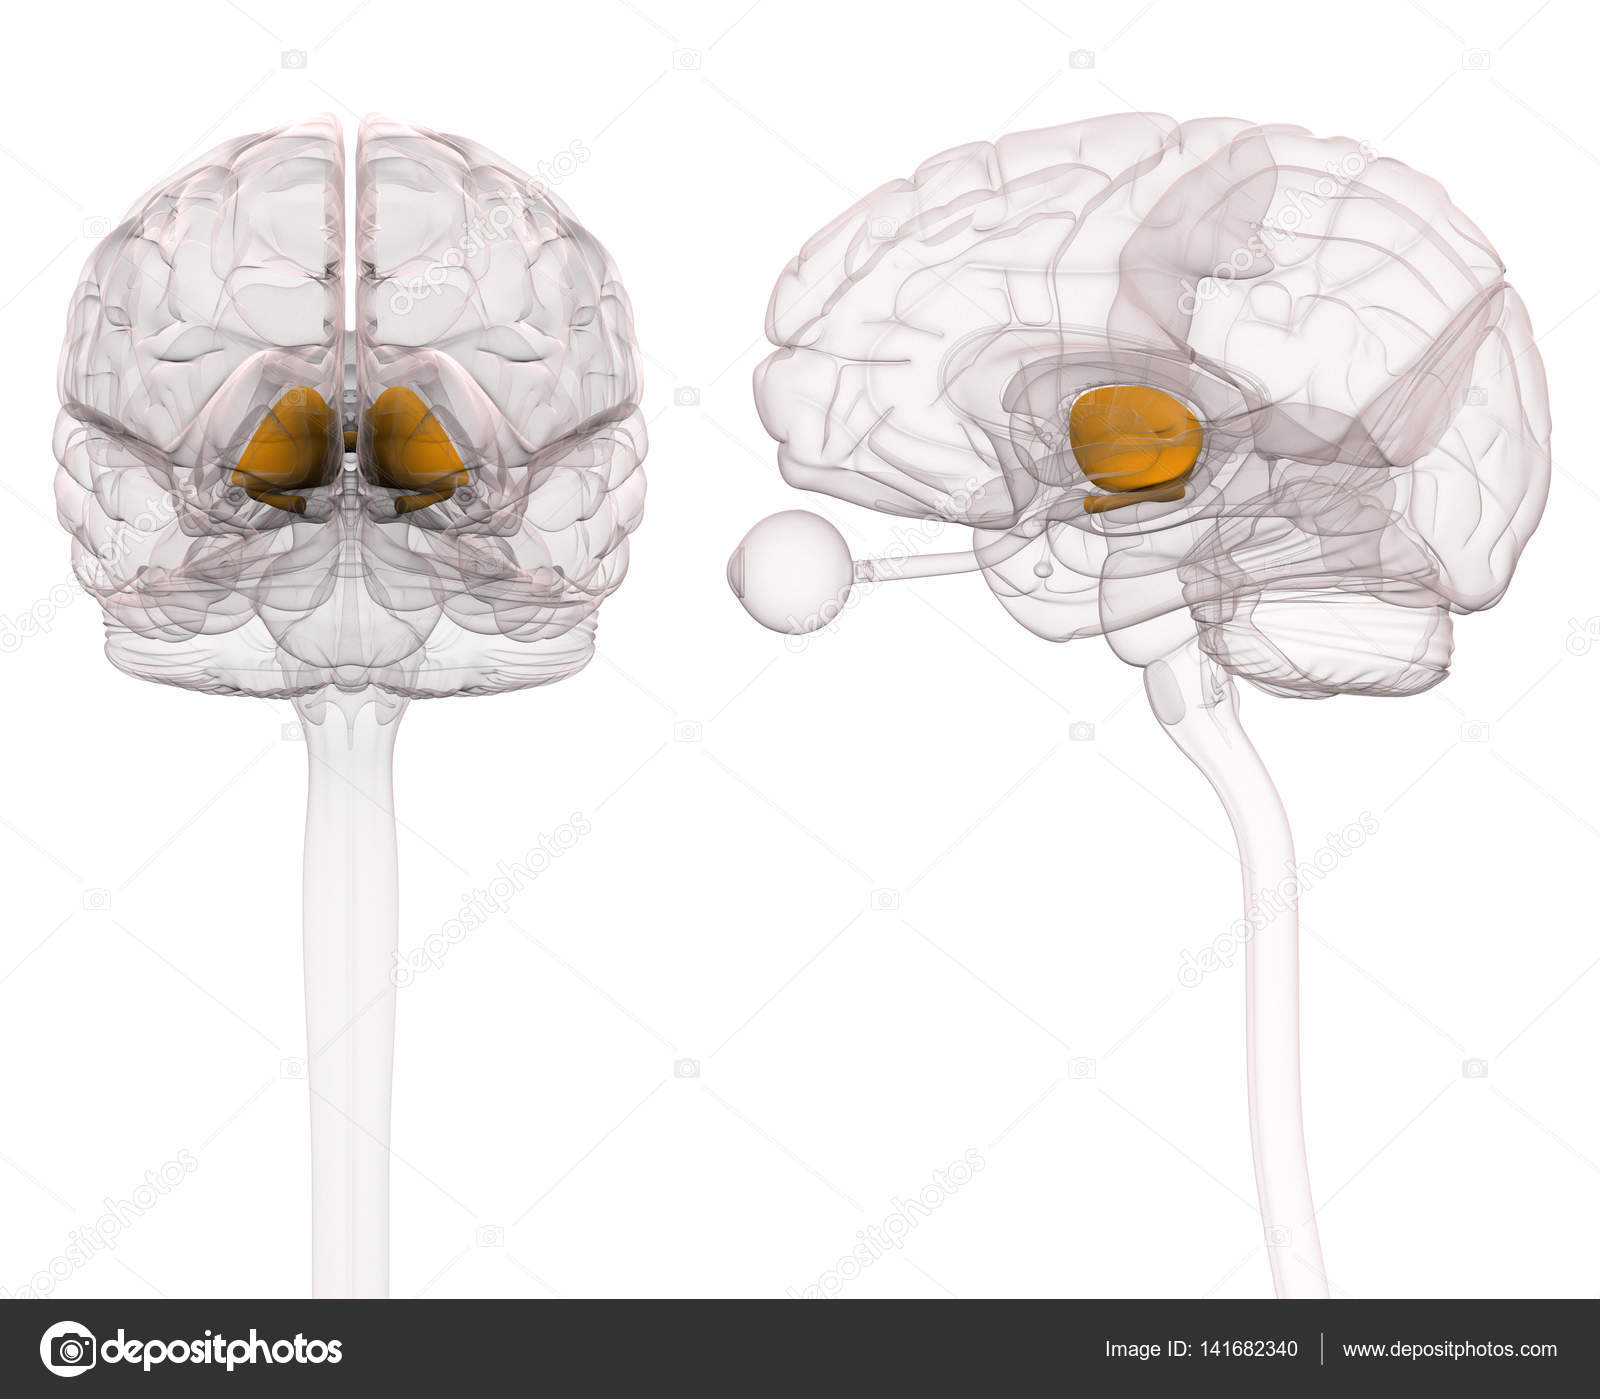 Thalamus Brain Anatomy — Stock Photo © decade3d #141682340